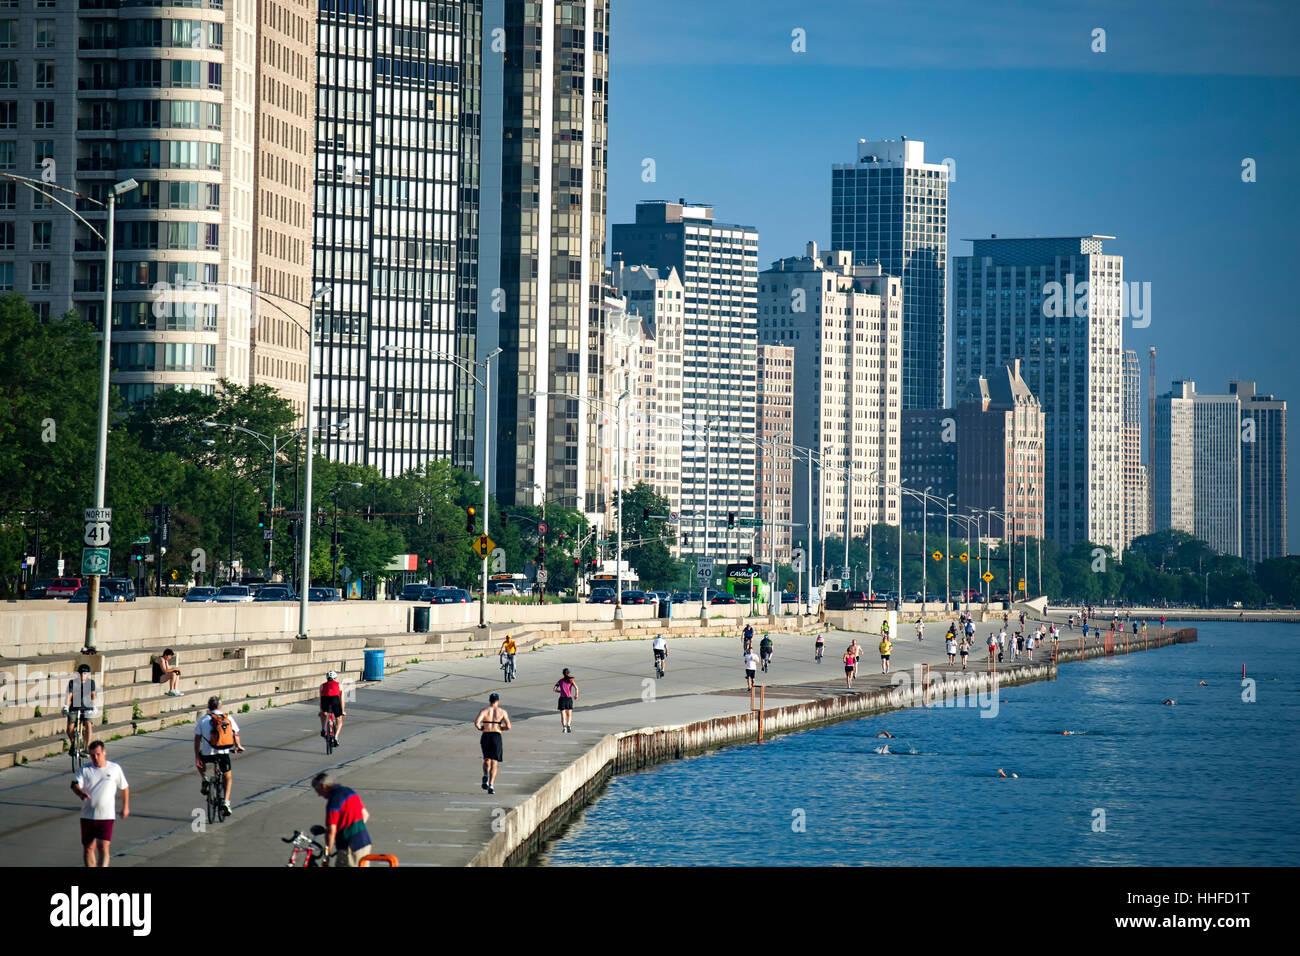 People exercising along Lake Michigan (near Ohio Street Beach), Chicago, Illinois USA - Stock Image